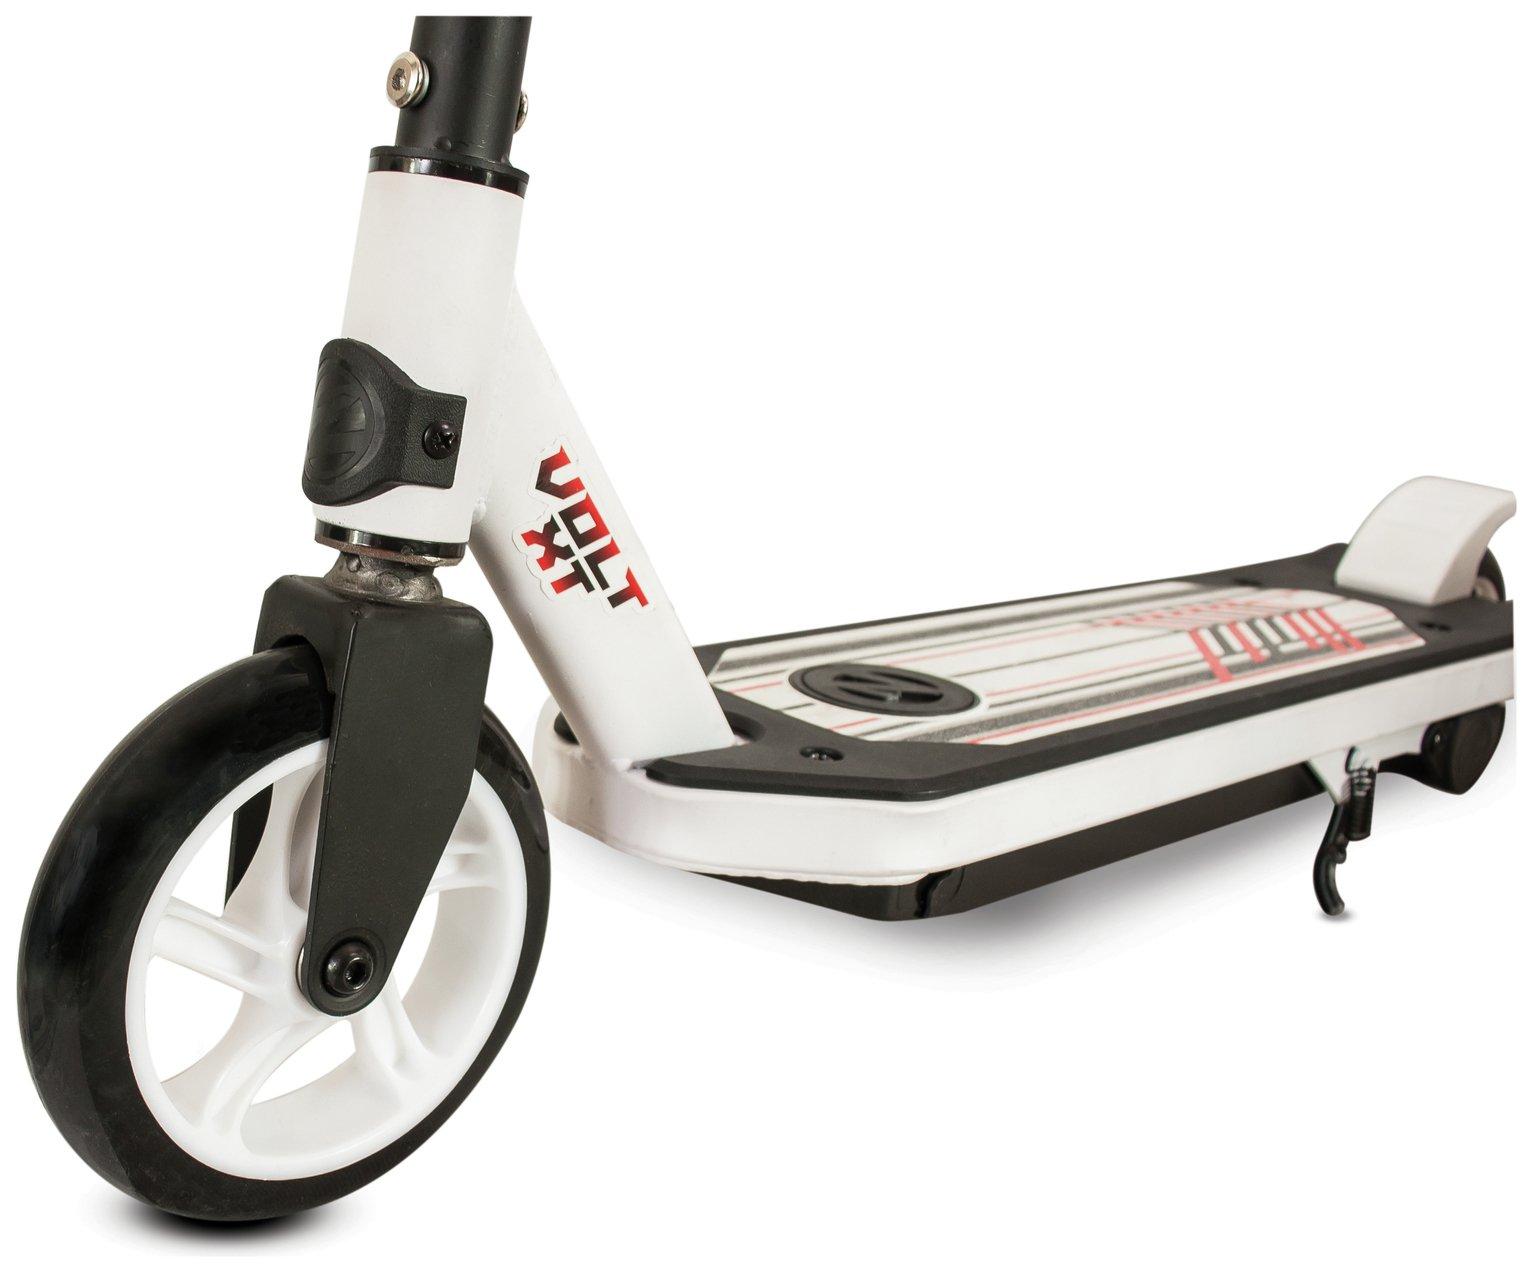 Buy Zinc Volt Xt Electric Scooter Scooters Argos